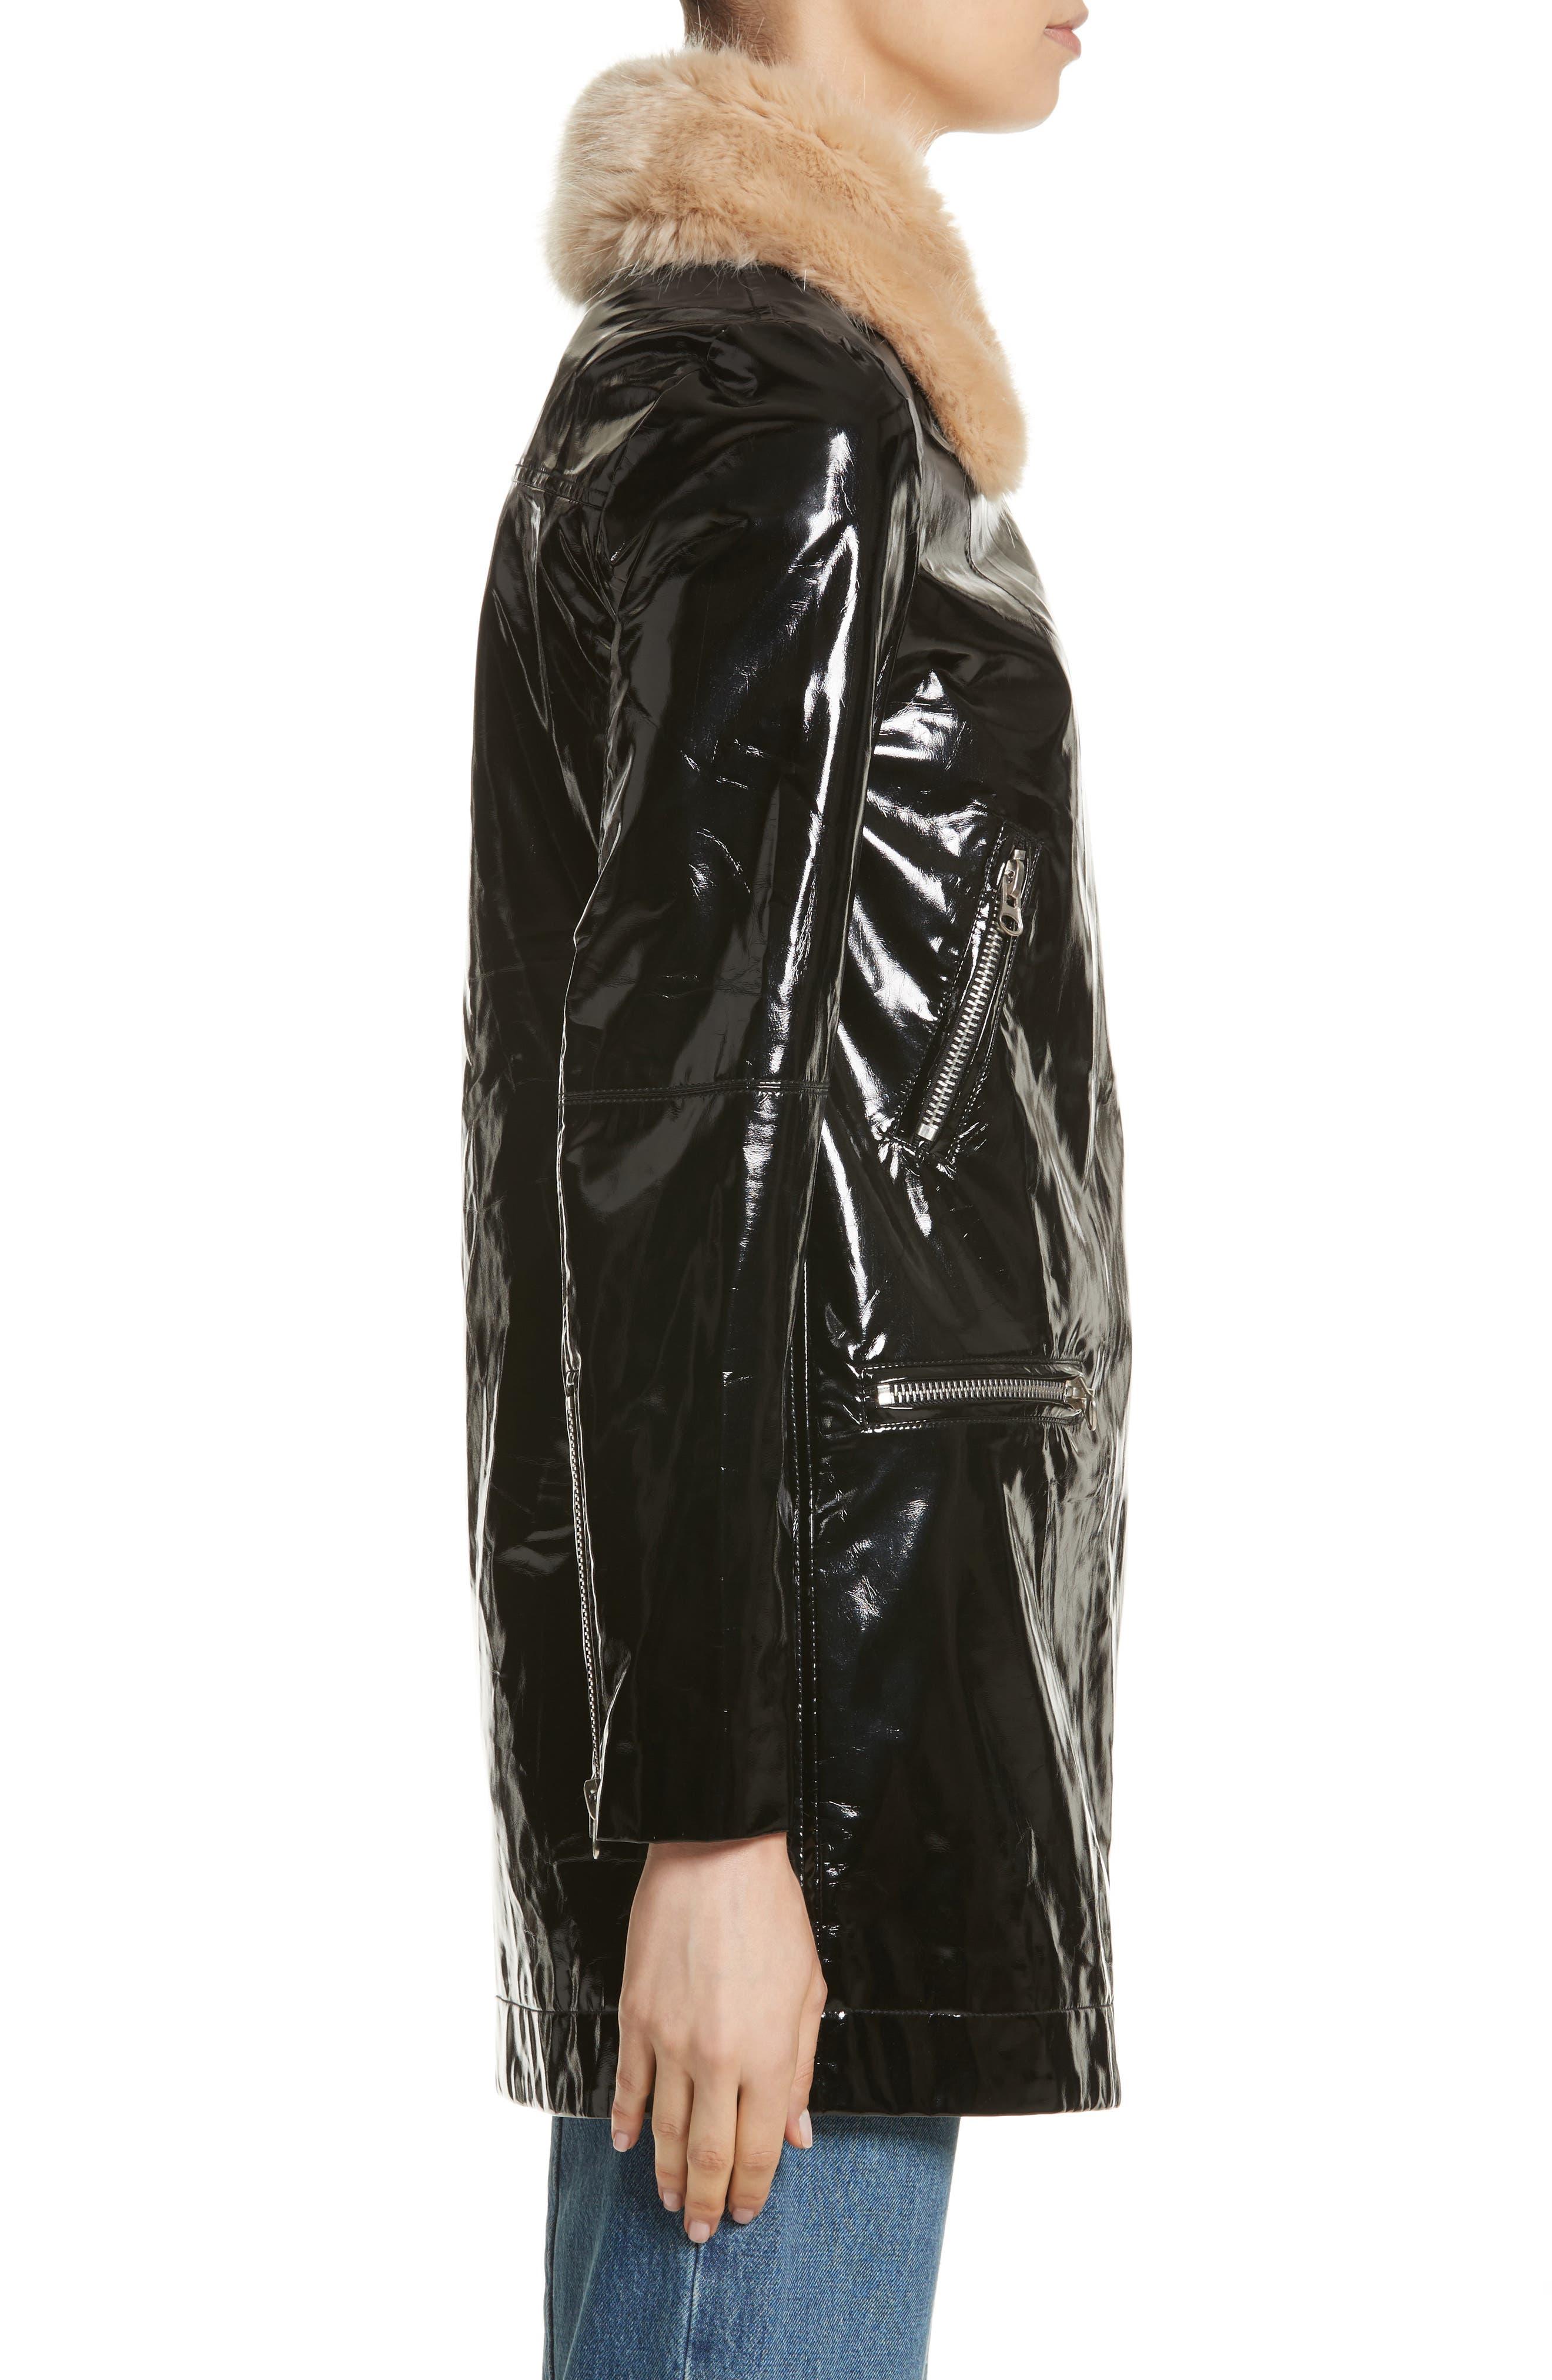 Olwen Faux Leather Long Biker Coat with Faux Fur Collar,                             Alternate thumbnail 4, color,                             001